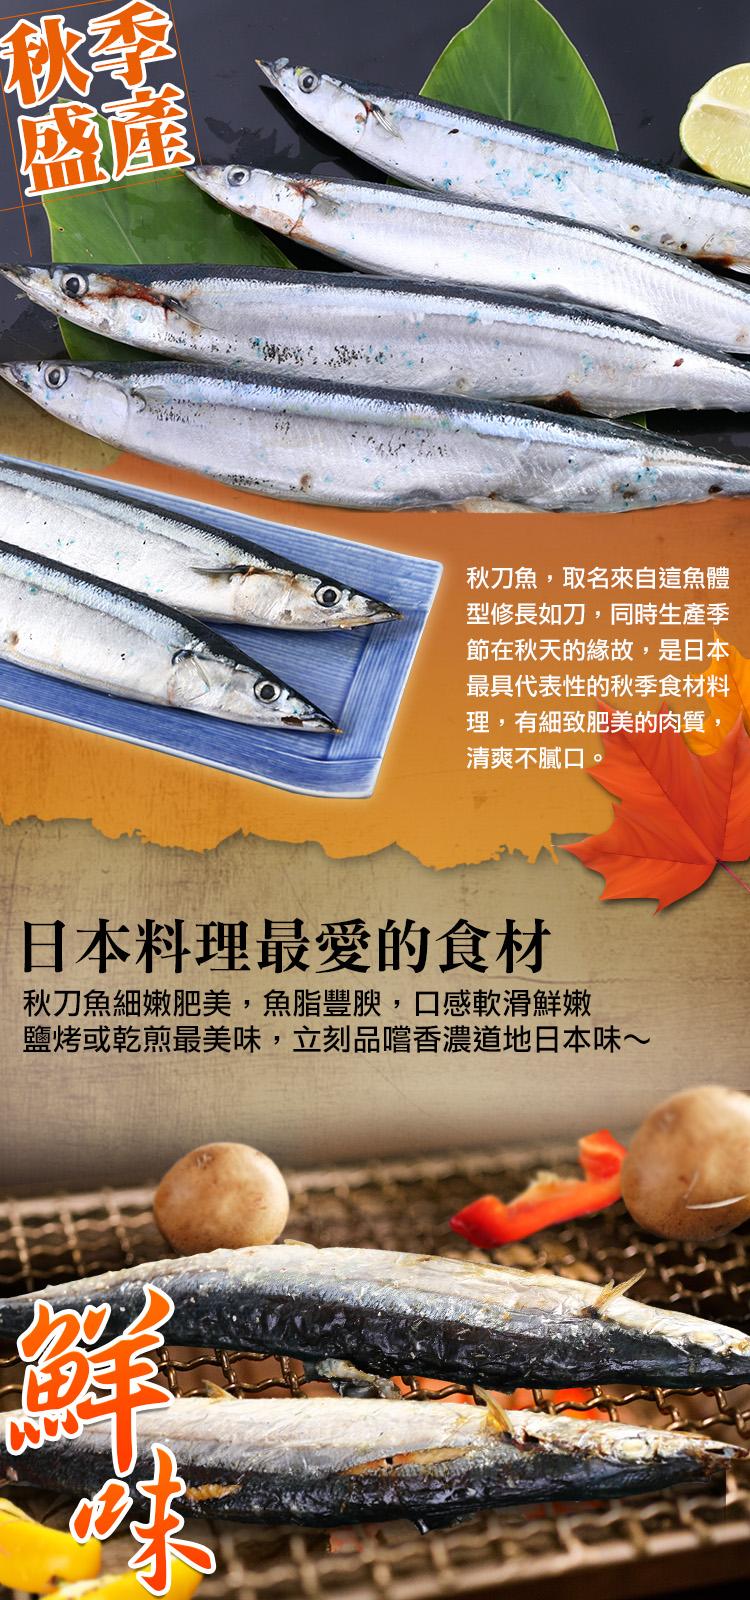 sauryfish10